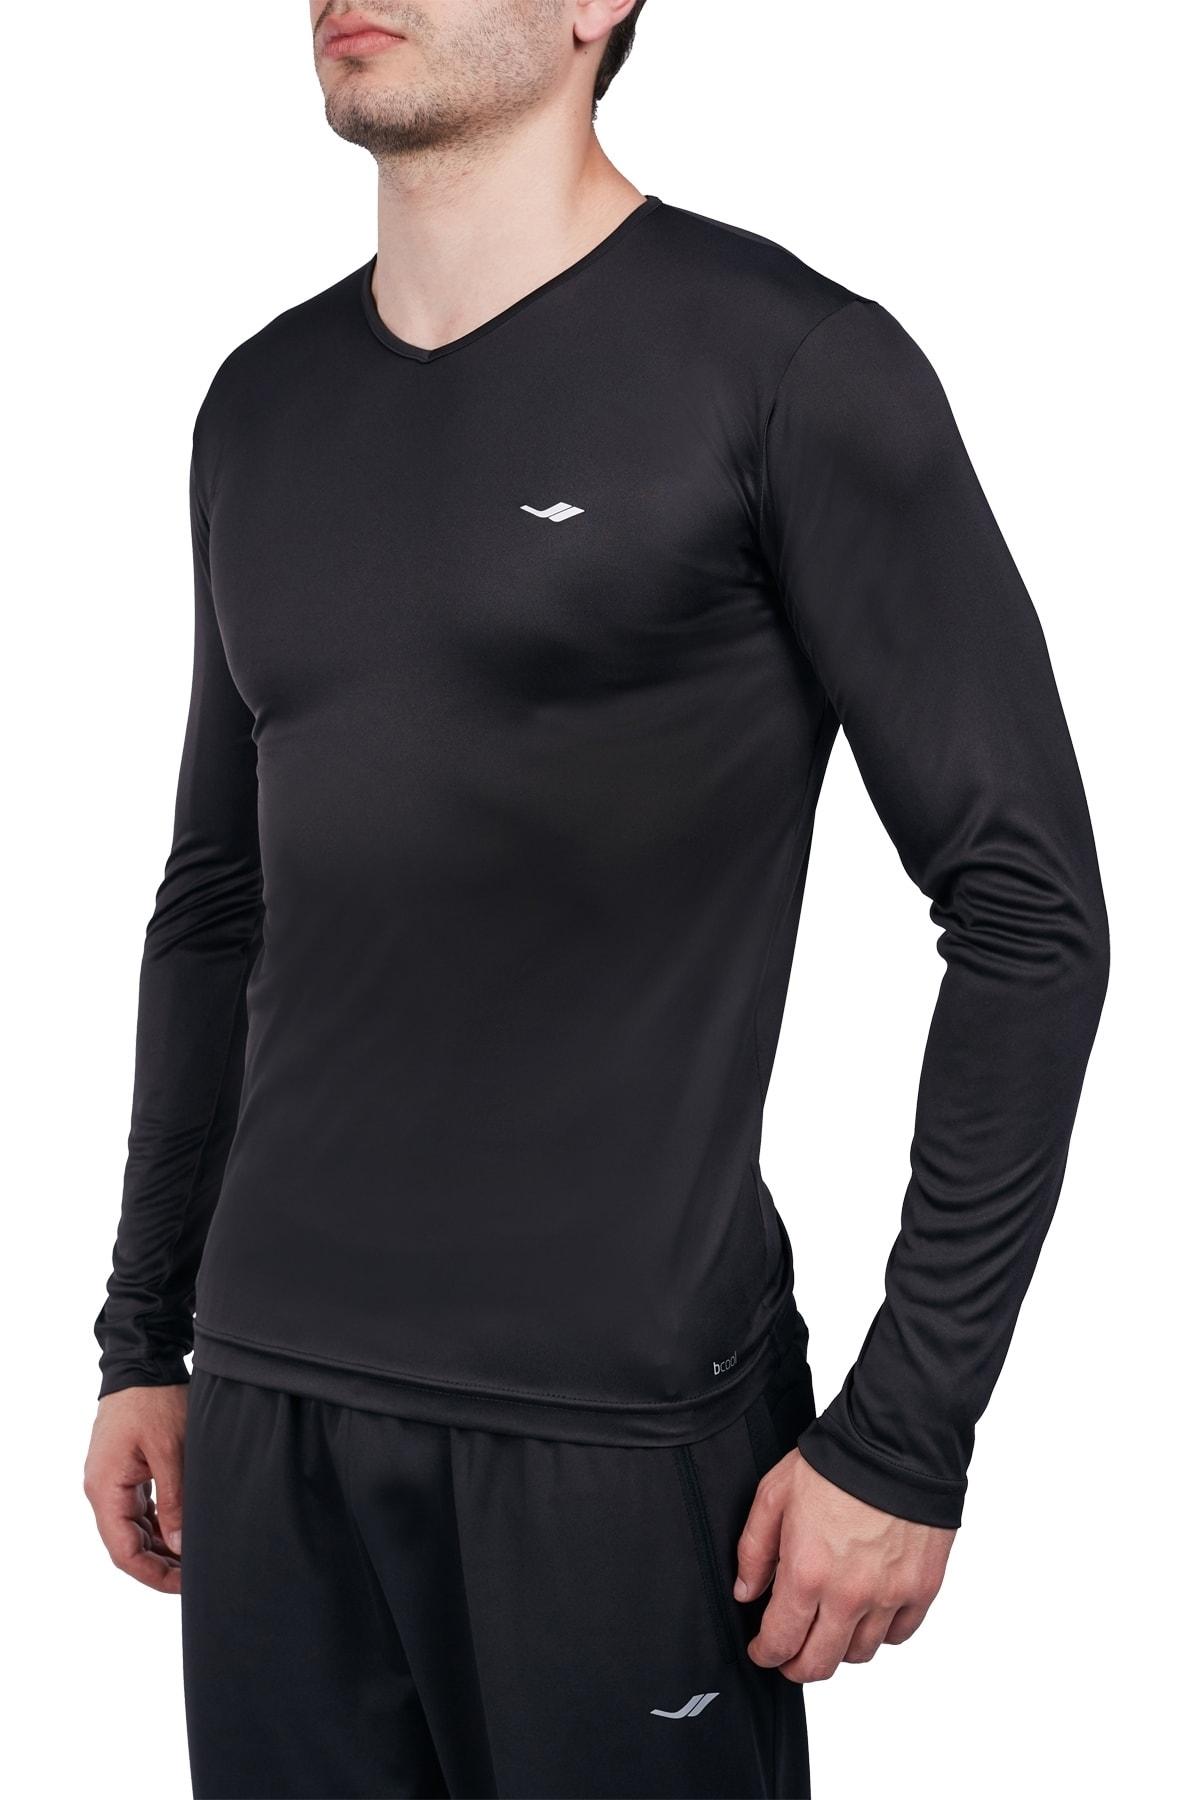 Siyah Erkek Uzun Kol T-shirt 20s-1223